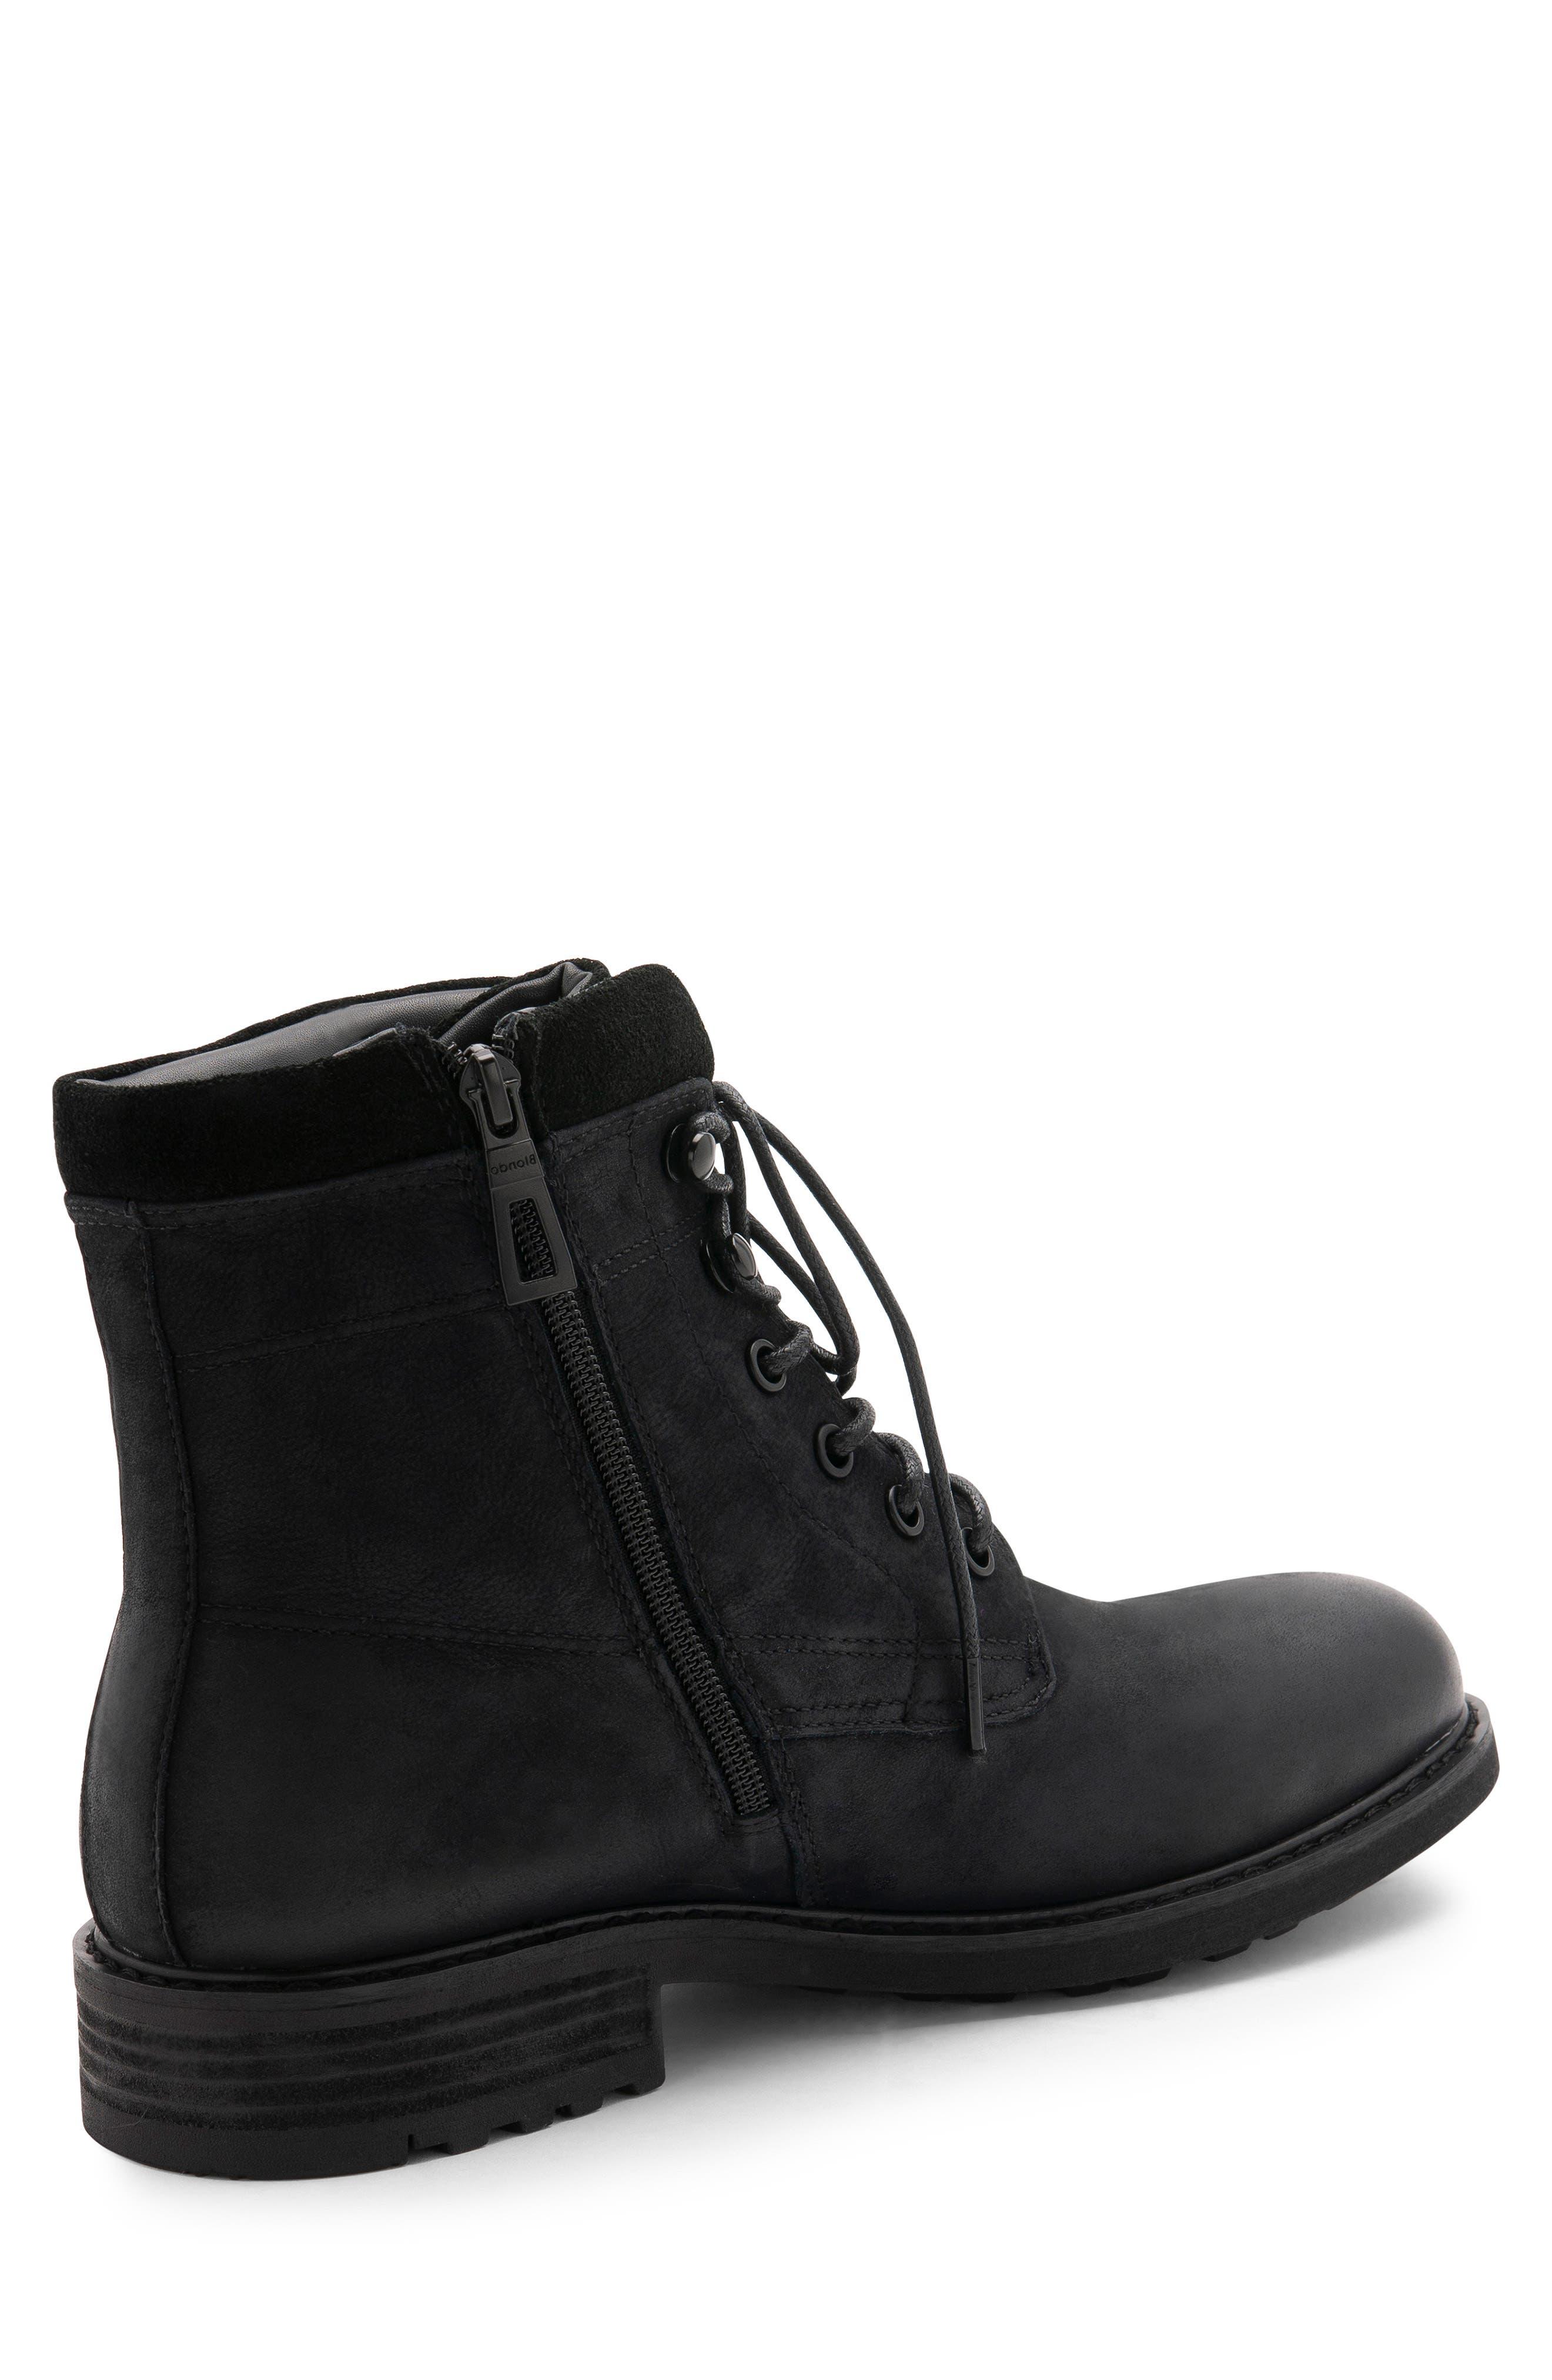 Patton Waterproof Plain Toe Boot,                             Alternate thumbnail 8, color,                             BLACK NUBUCK